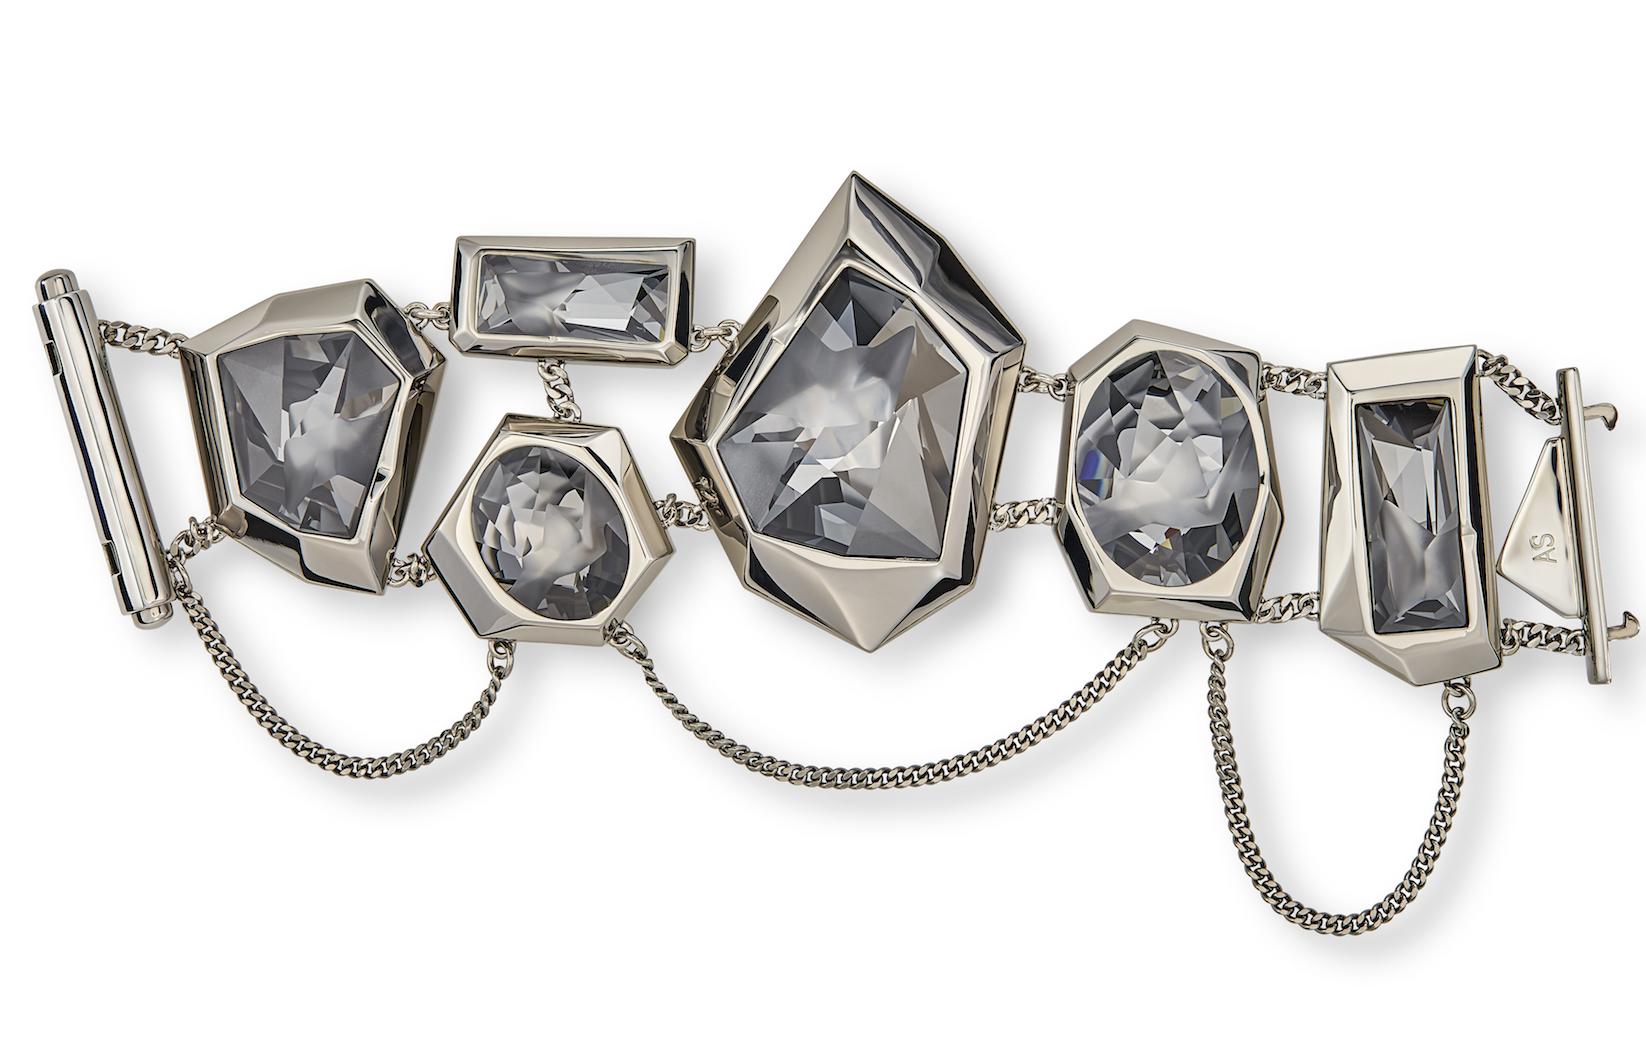 Atelier Swarovski by Jean Paul Gaultier - bracelet